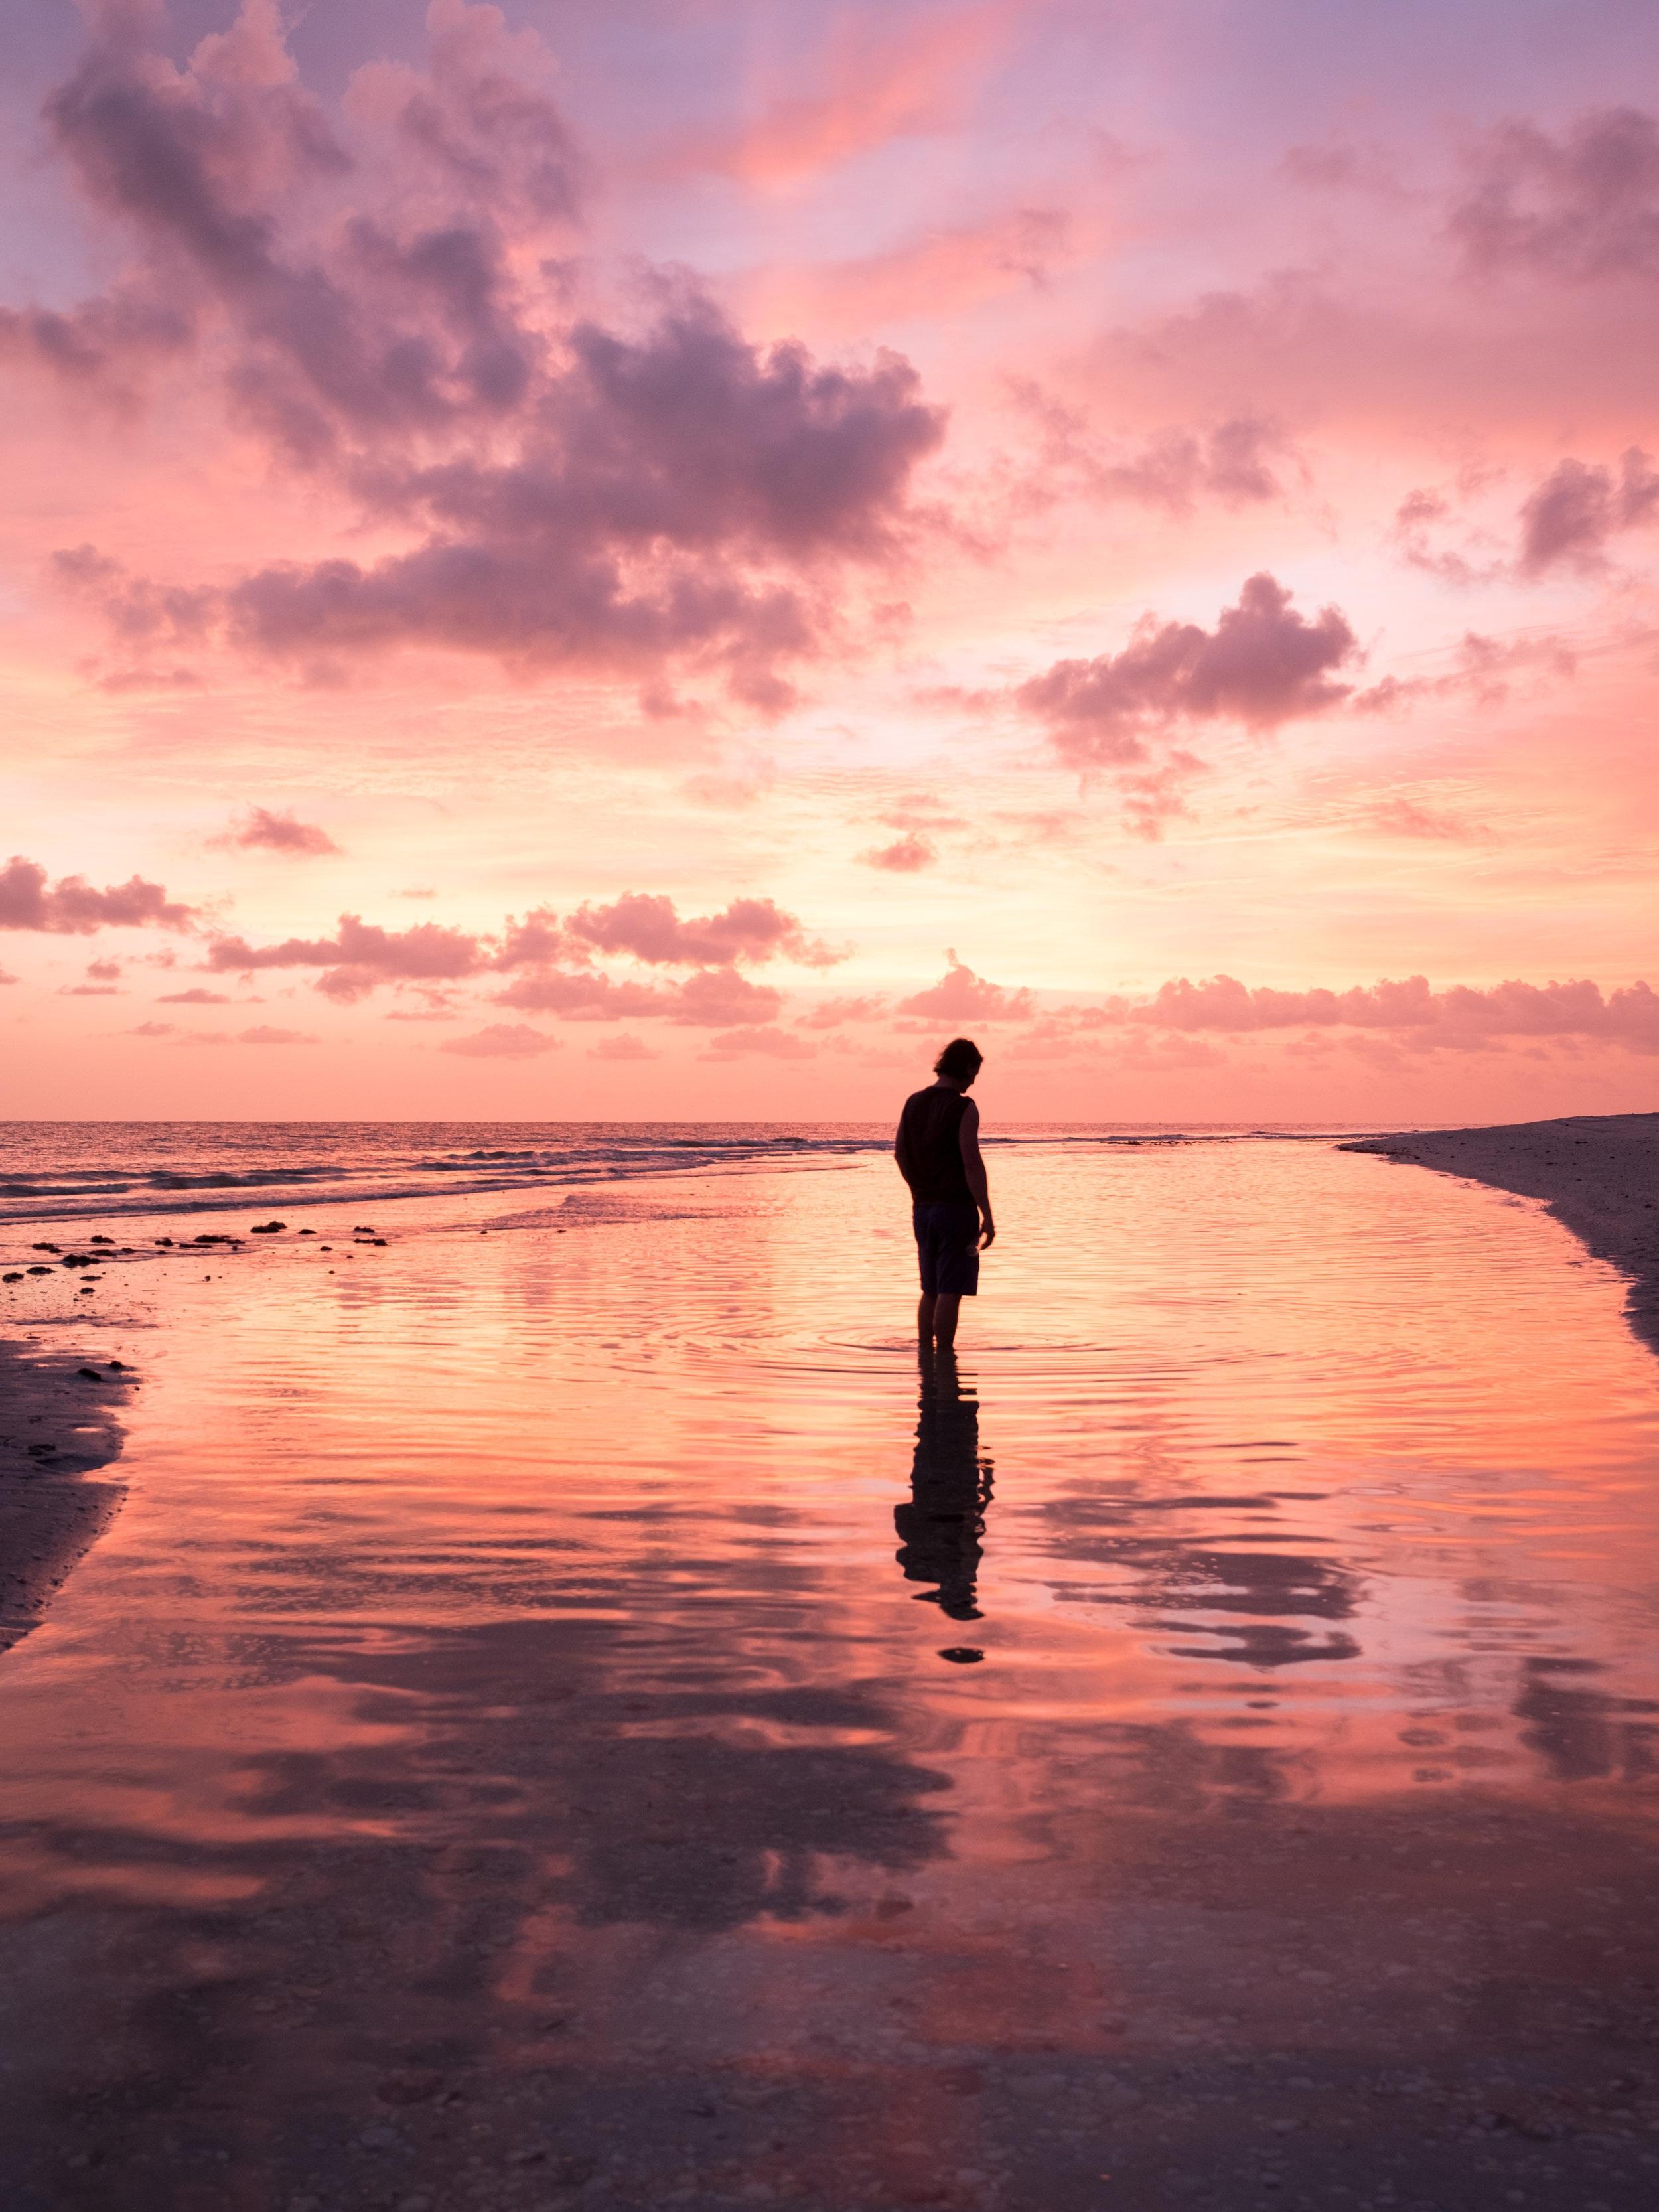 sanibel+island+sunset+katelin+reeser